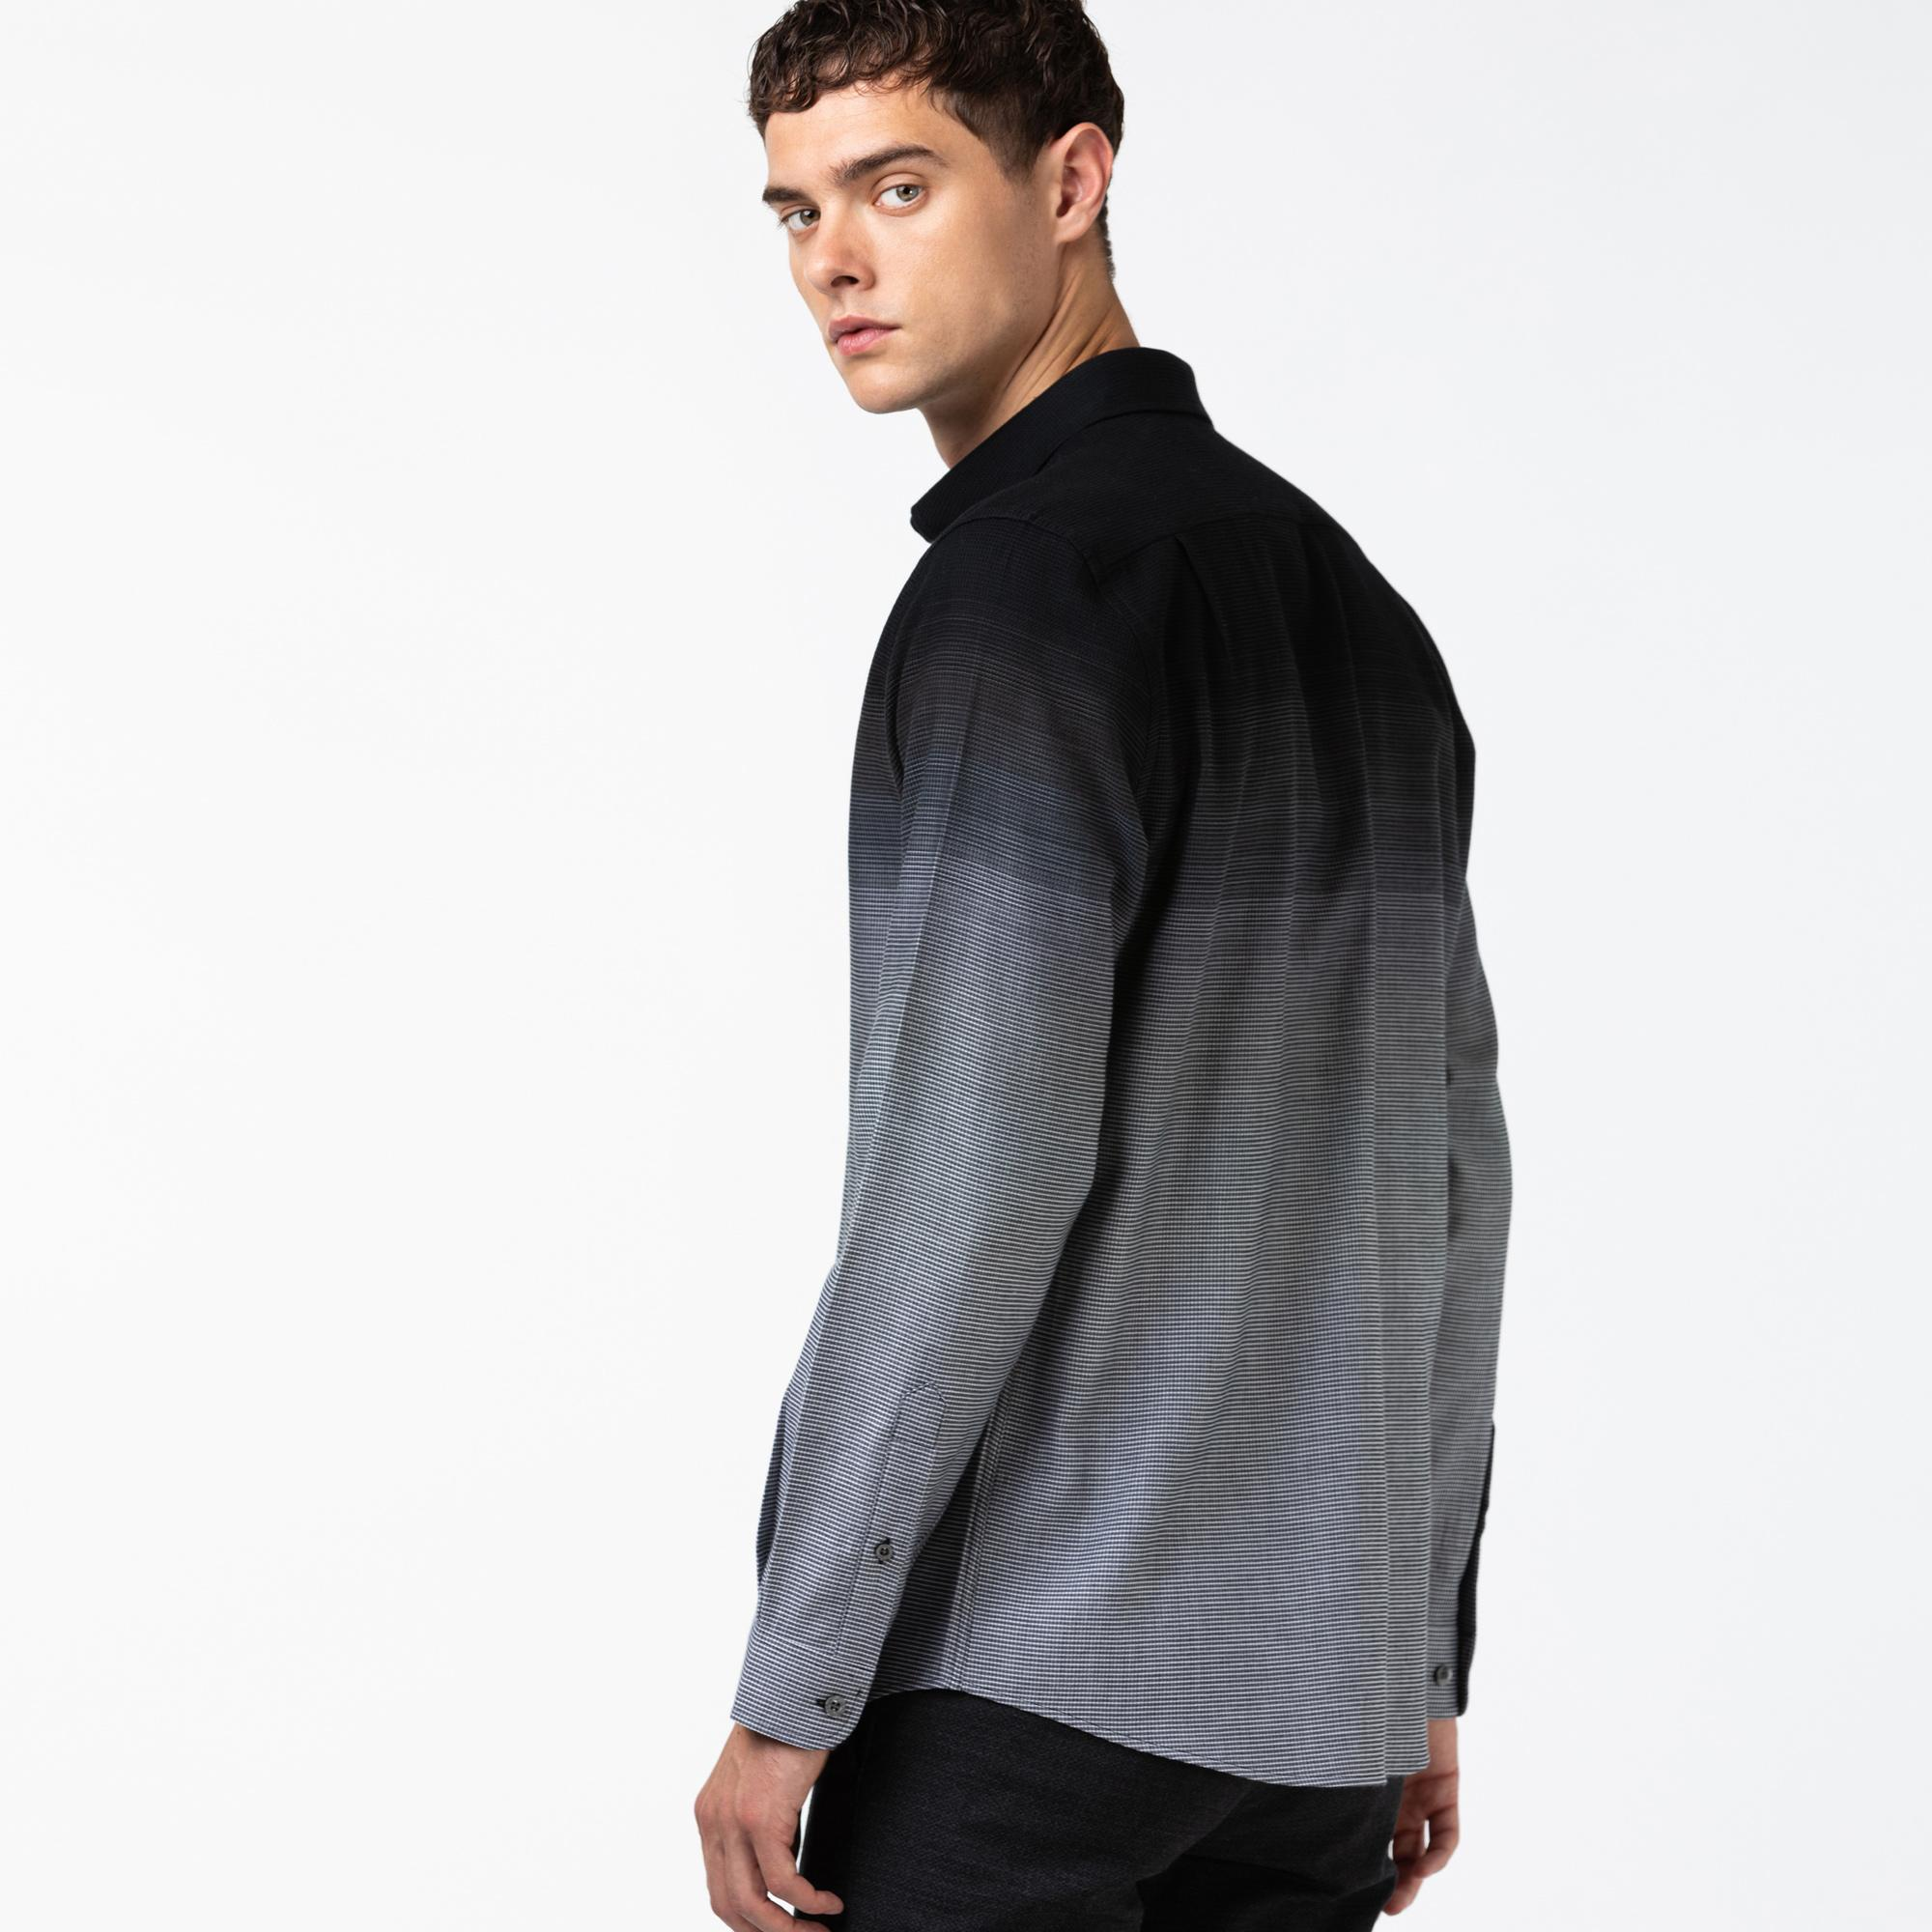 Lacoste Erkek Slim Fit Blok Desenli Siyah Gömlek